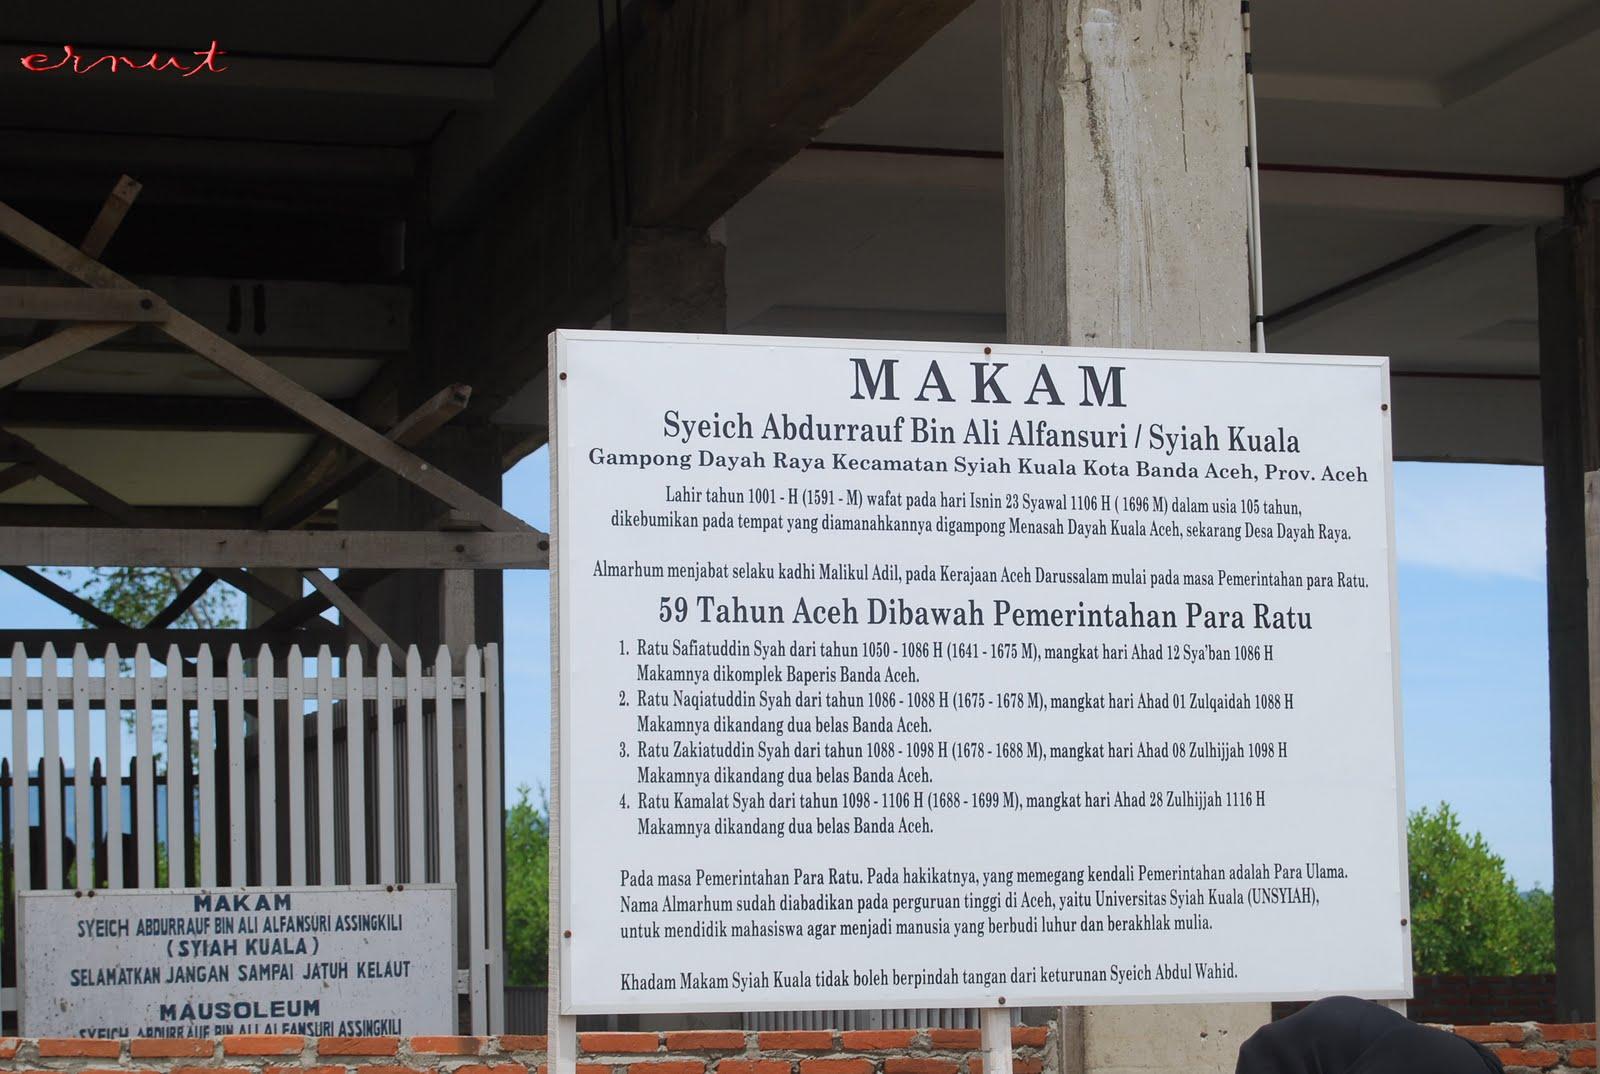 Bala Kurawa Ernut Makam Syiah Kuala Kota Banda Aceh